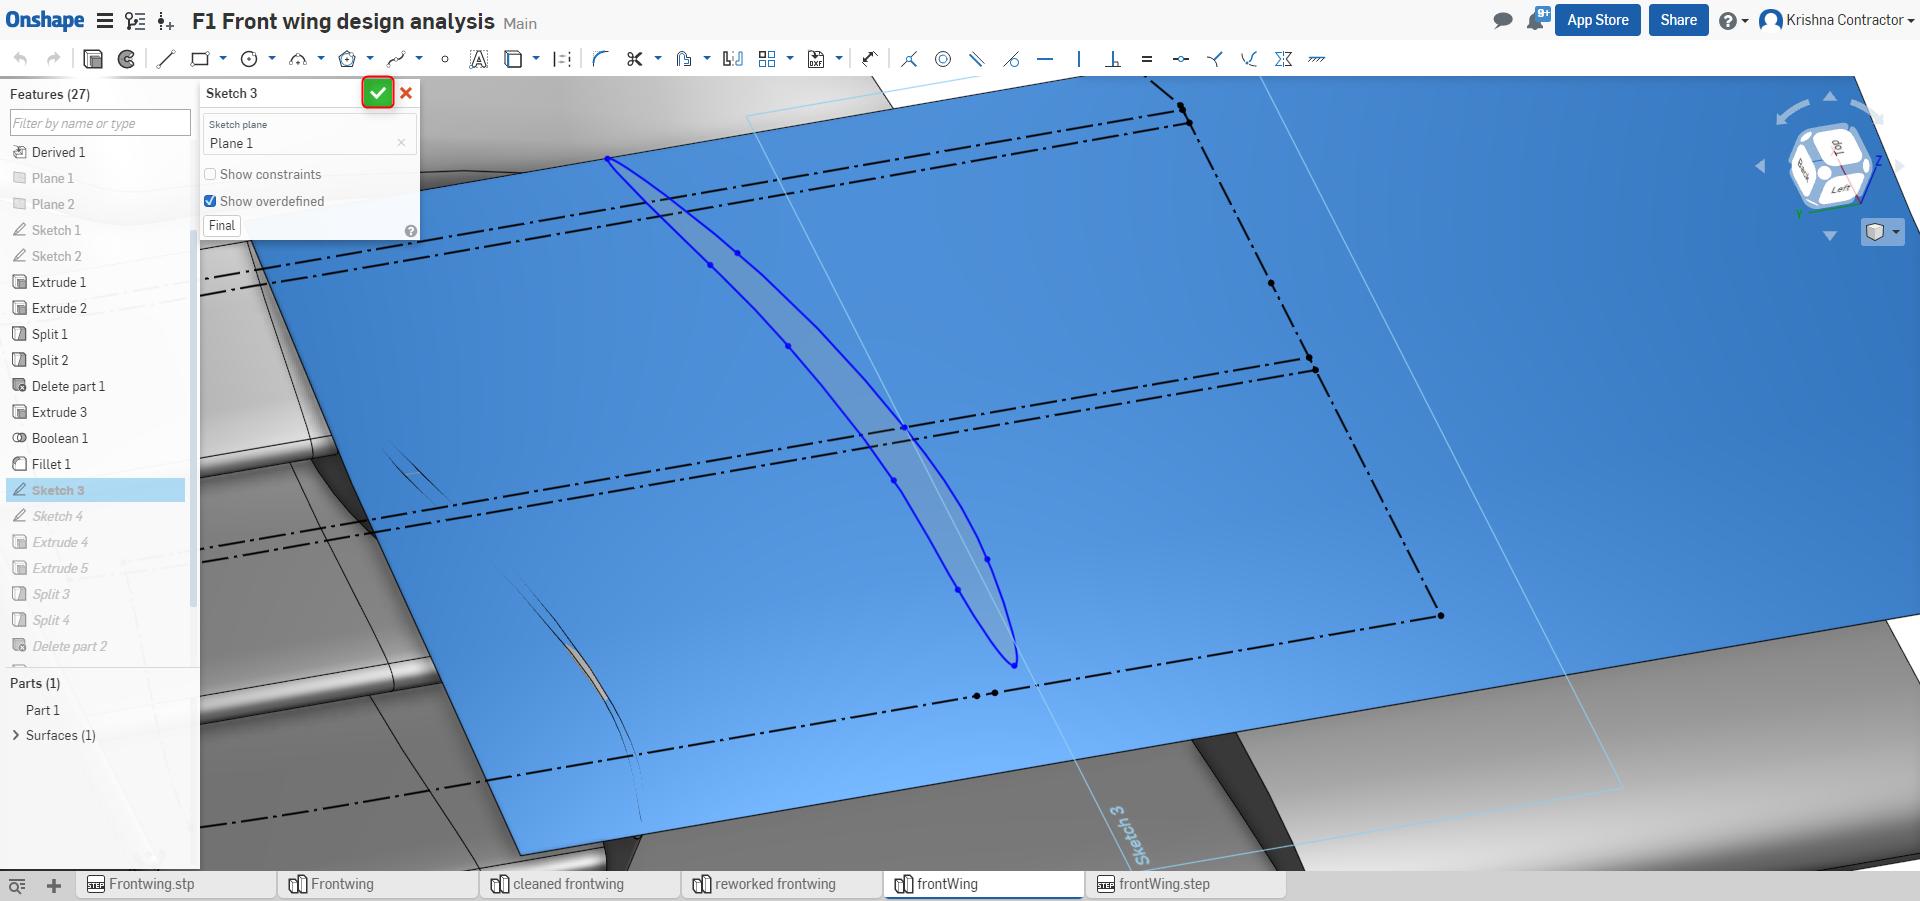 f1 aerodynamics f1 front wing vane design onshape